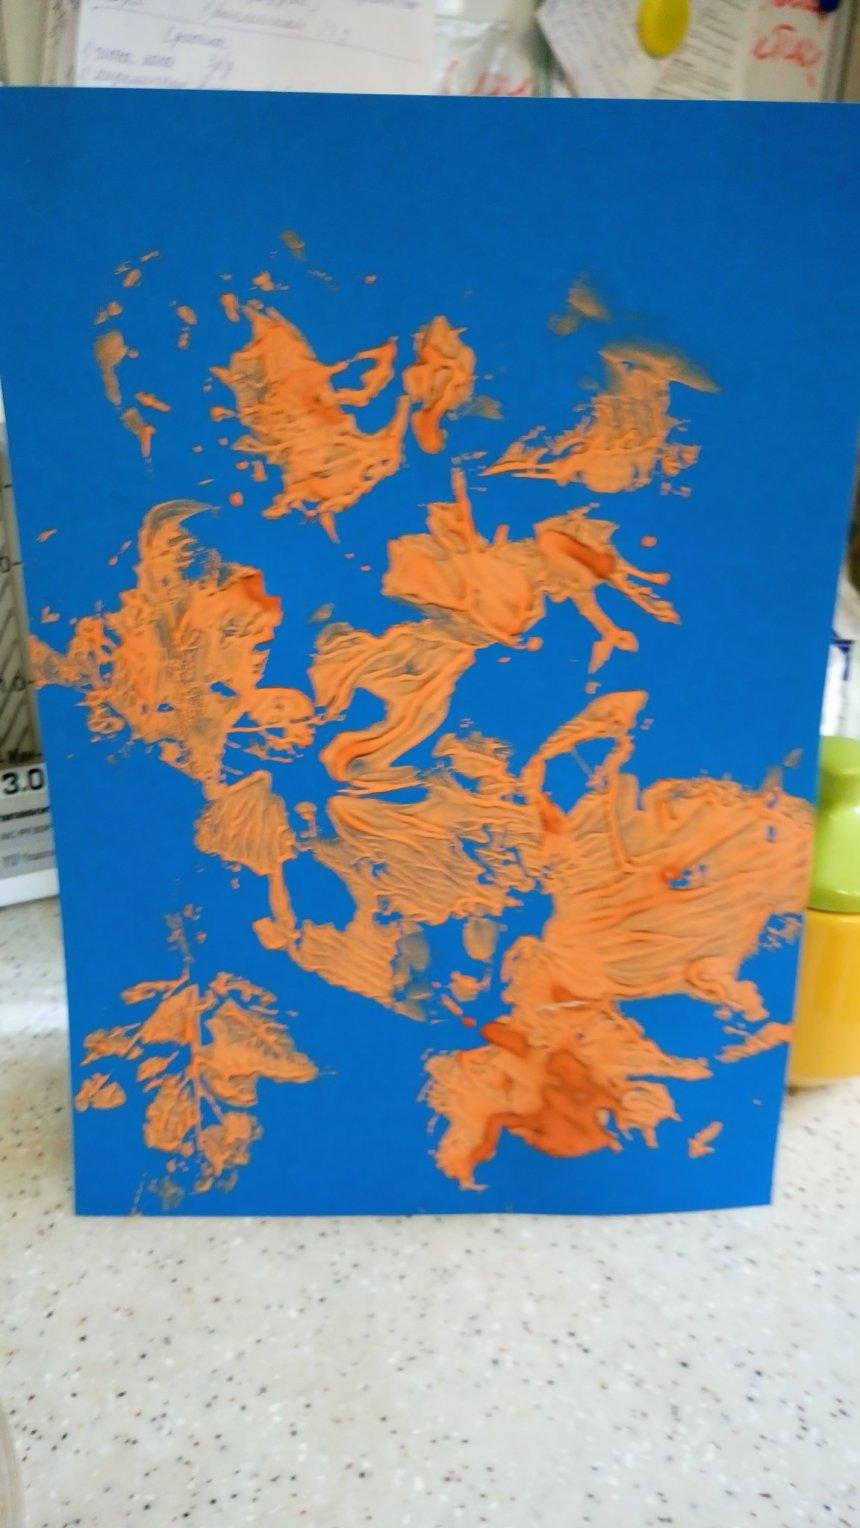 Отчёт по занятию Сделайте вместе с ребенком отпечатки листьев в Wachanga!